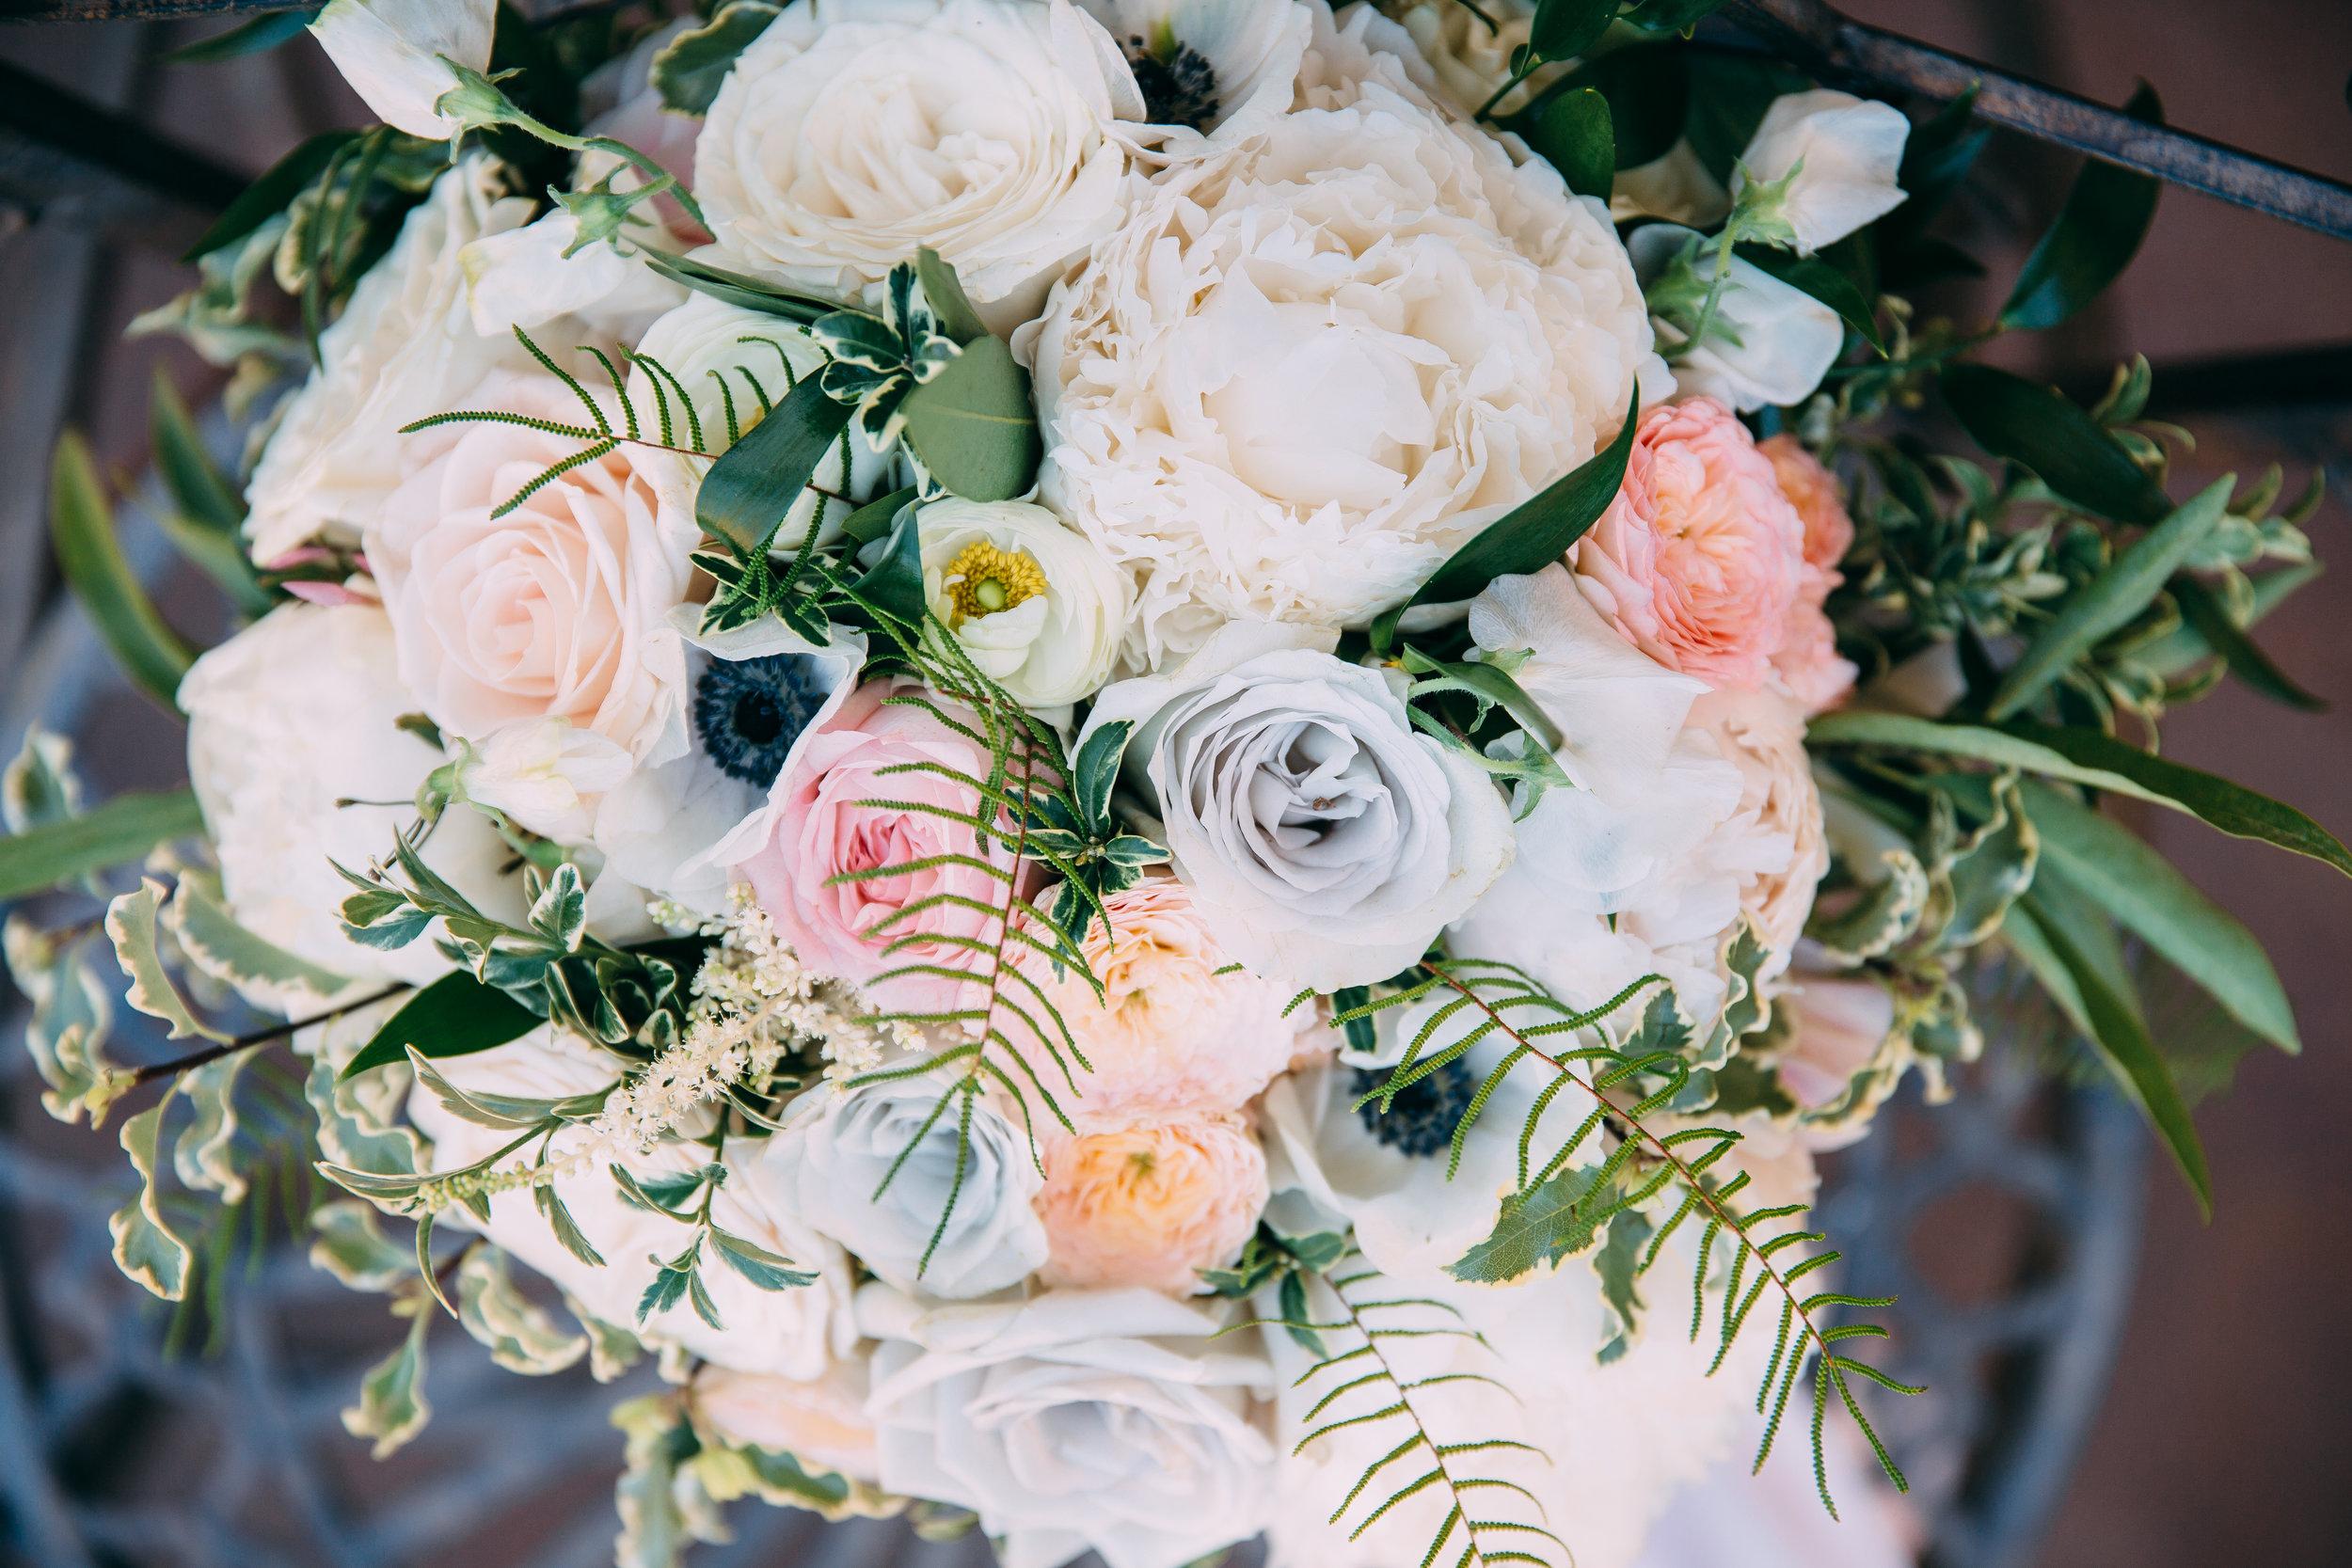 Violette-fleurs-anna-perevertaylo-White-Blush-elegant-flowers-for-wedding-decor-upscale-design-roseville-sacramento-california-rancho-robles-vinyards-lincoln-elegant-luxury-bridal-bouquet.jpg